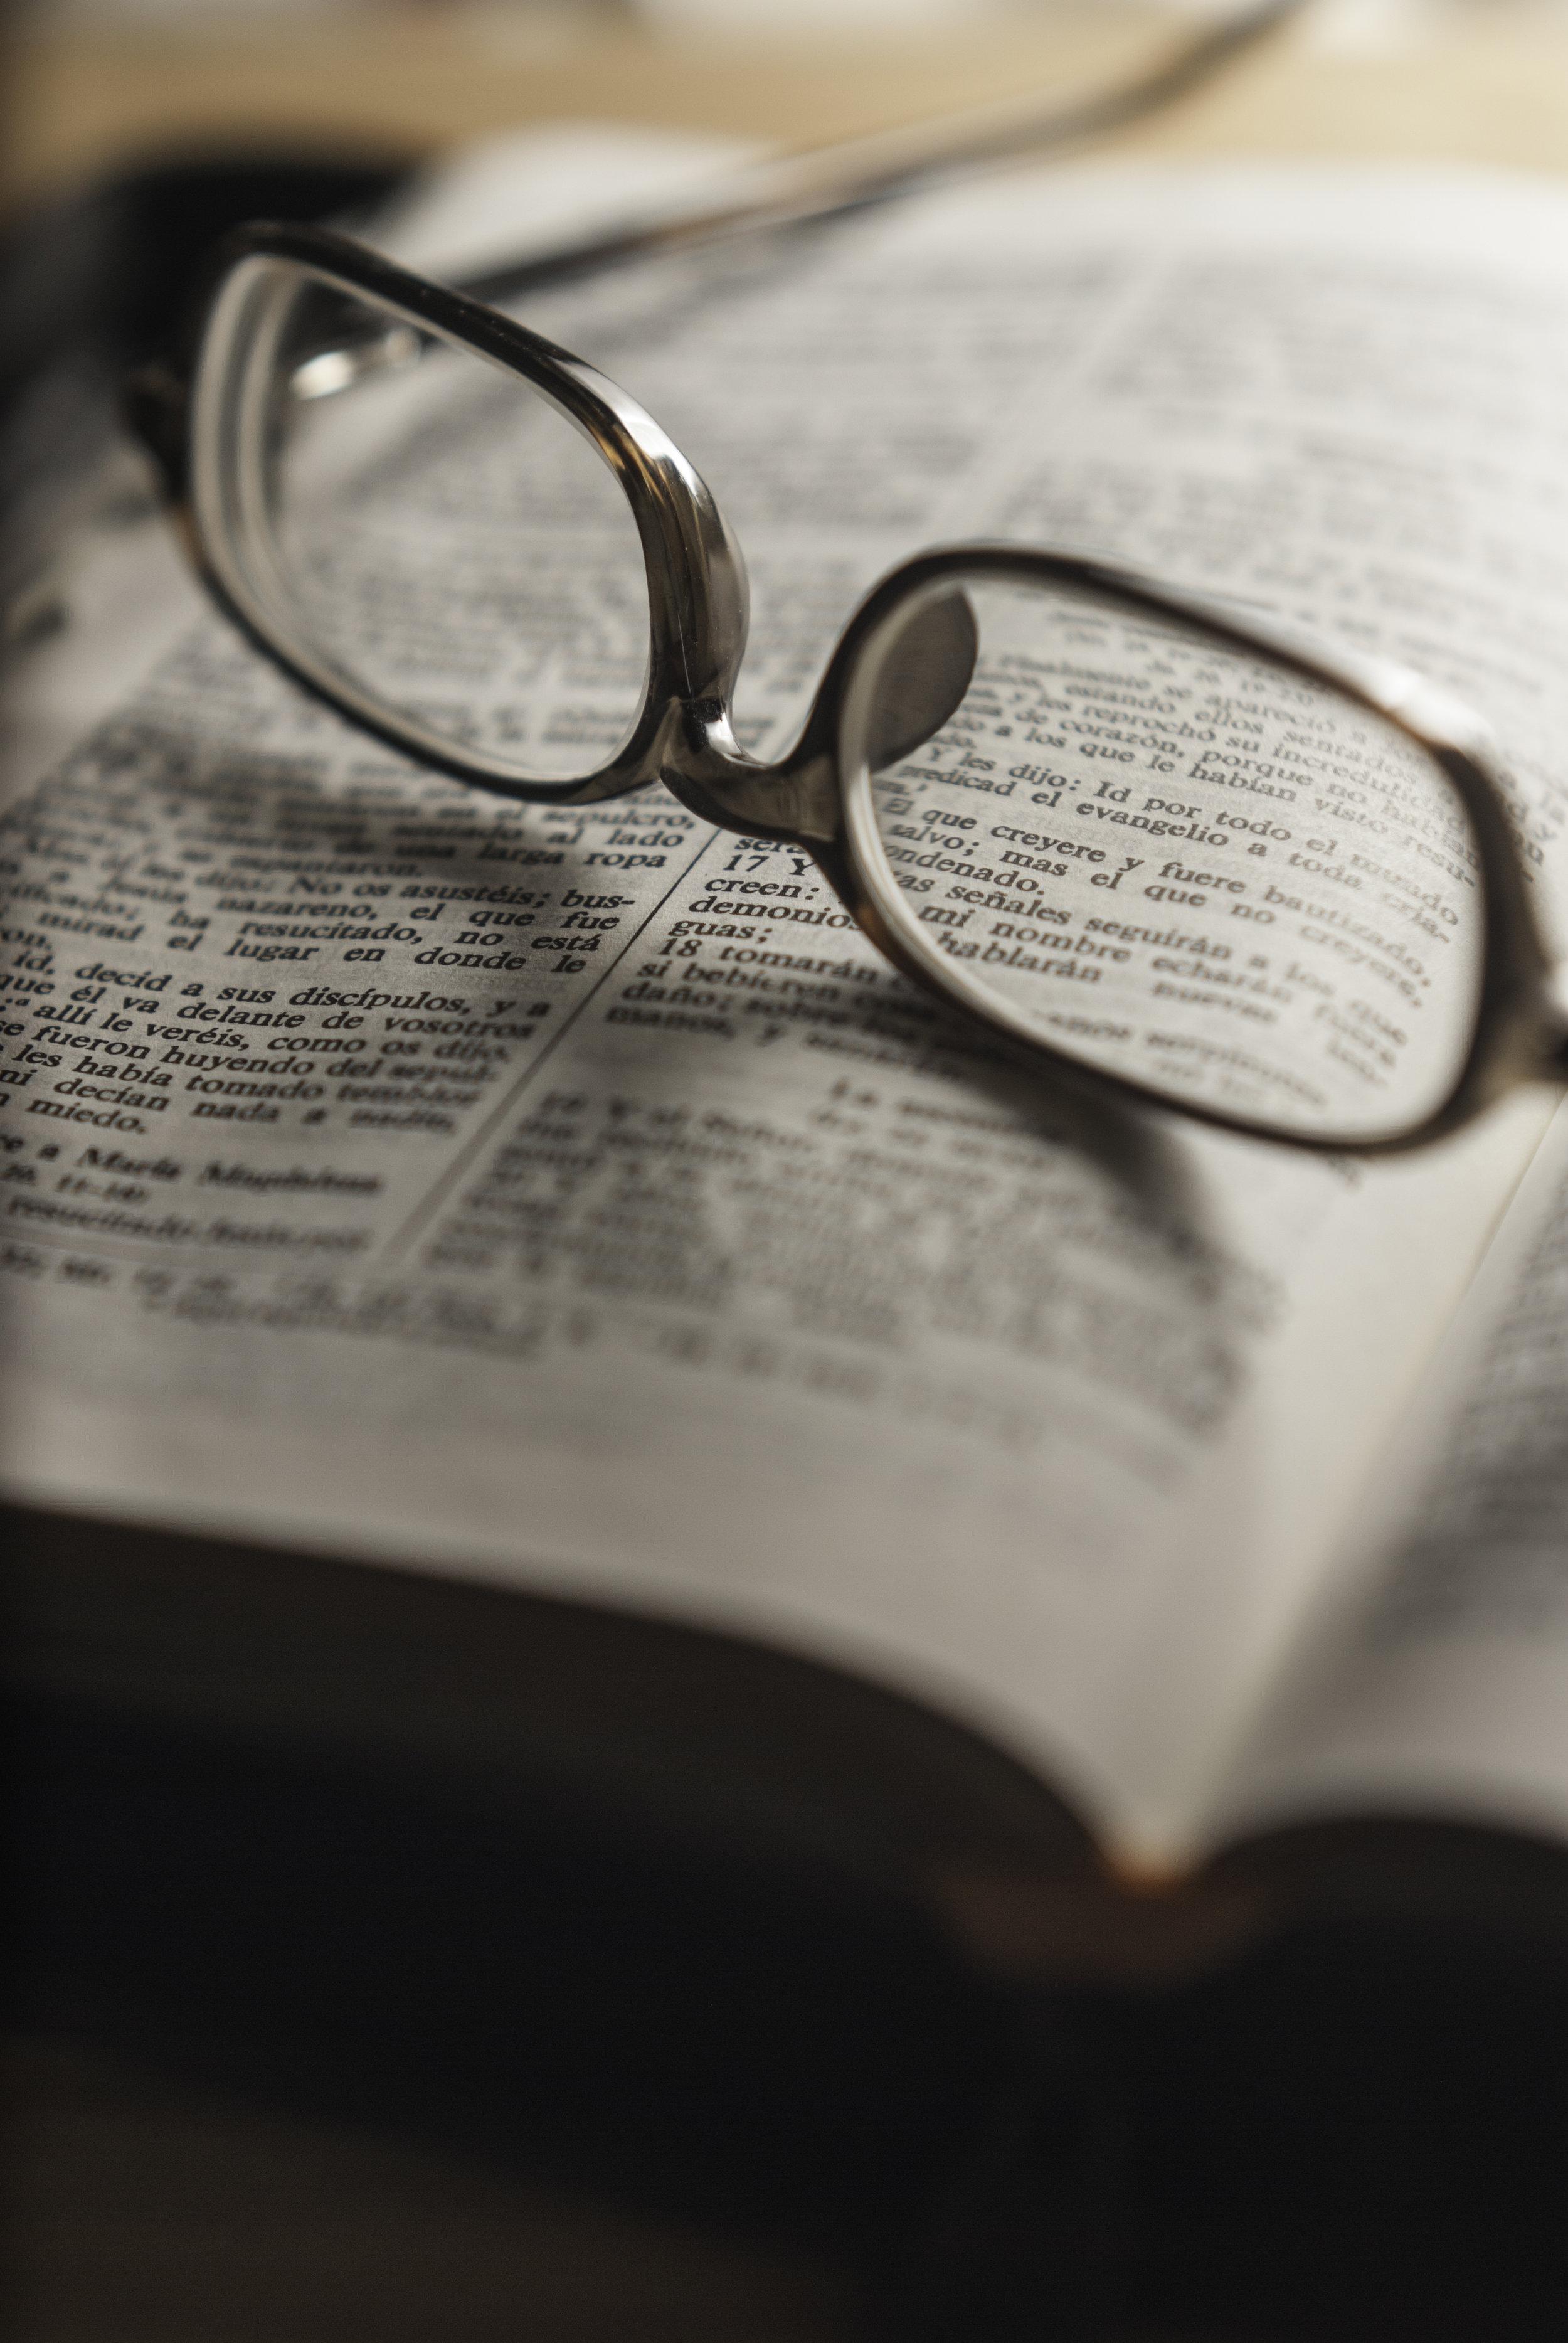 christian-leadership-coaching-positives-problems-laser-focused-leaders.jpg